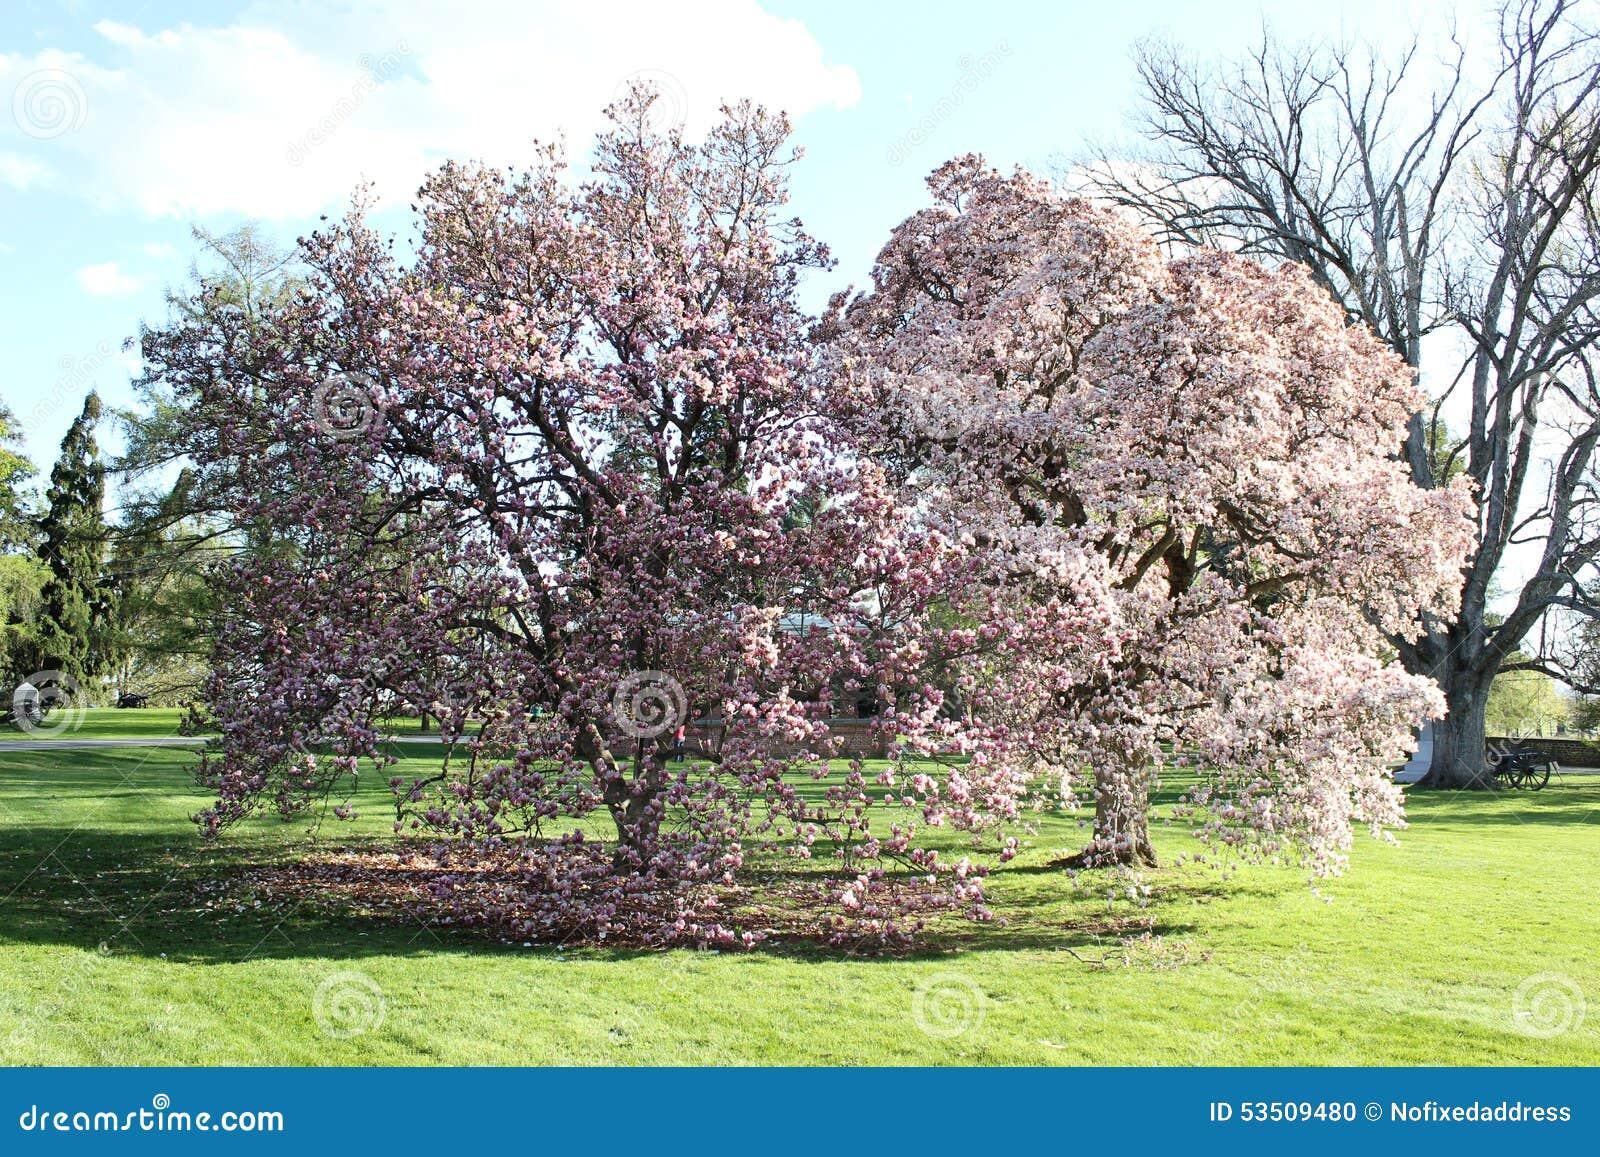 Magnolia Tree Pennsylvania Stock Photo Image Of Gettysburg 53509480